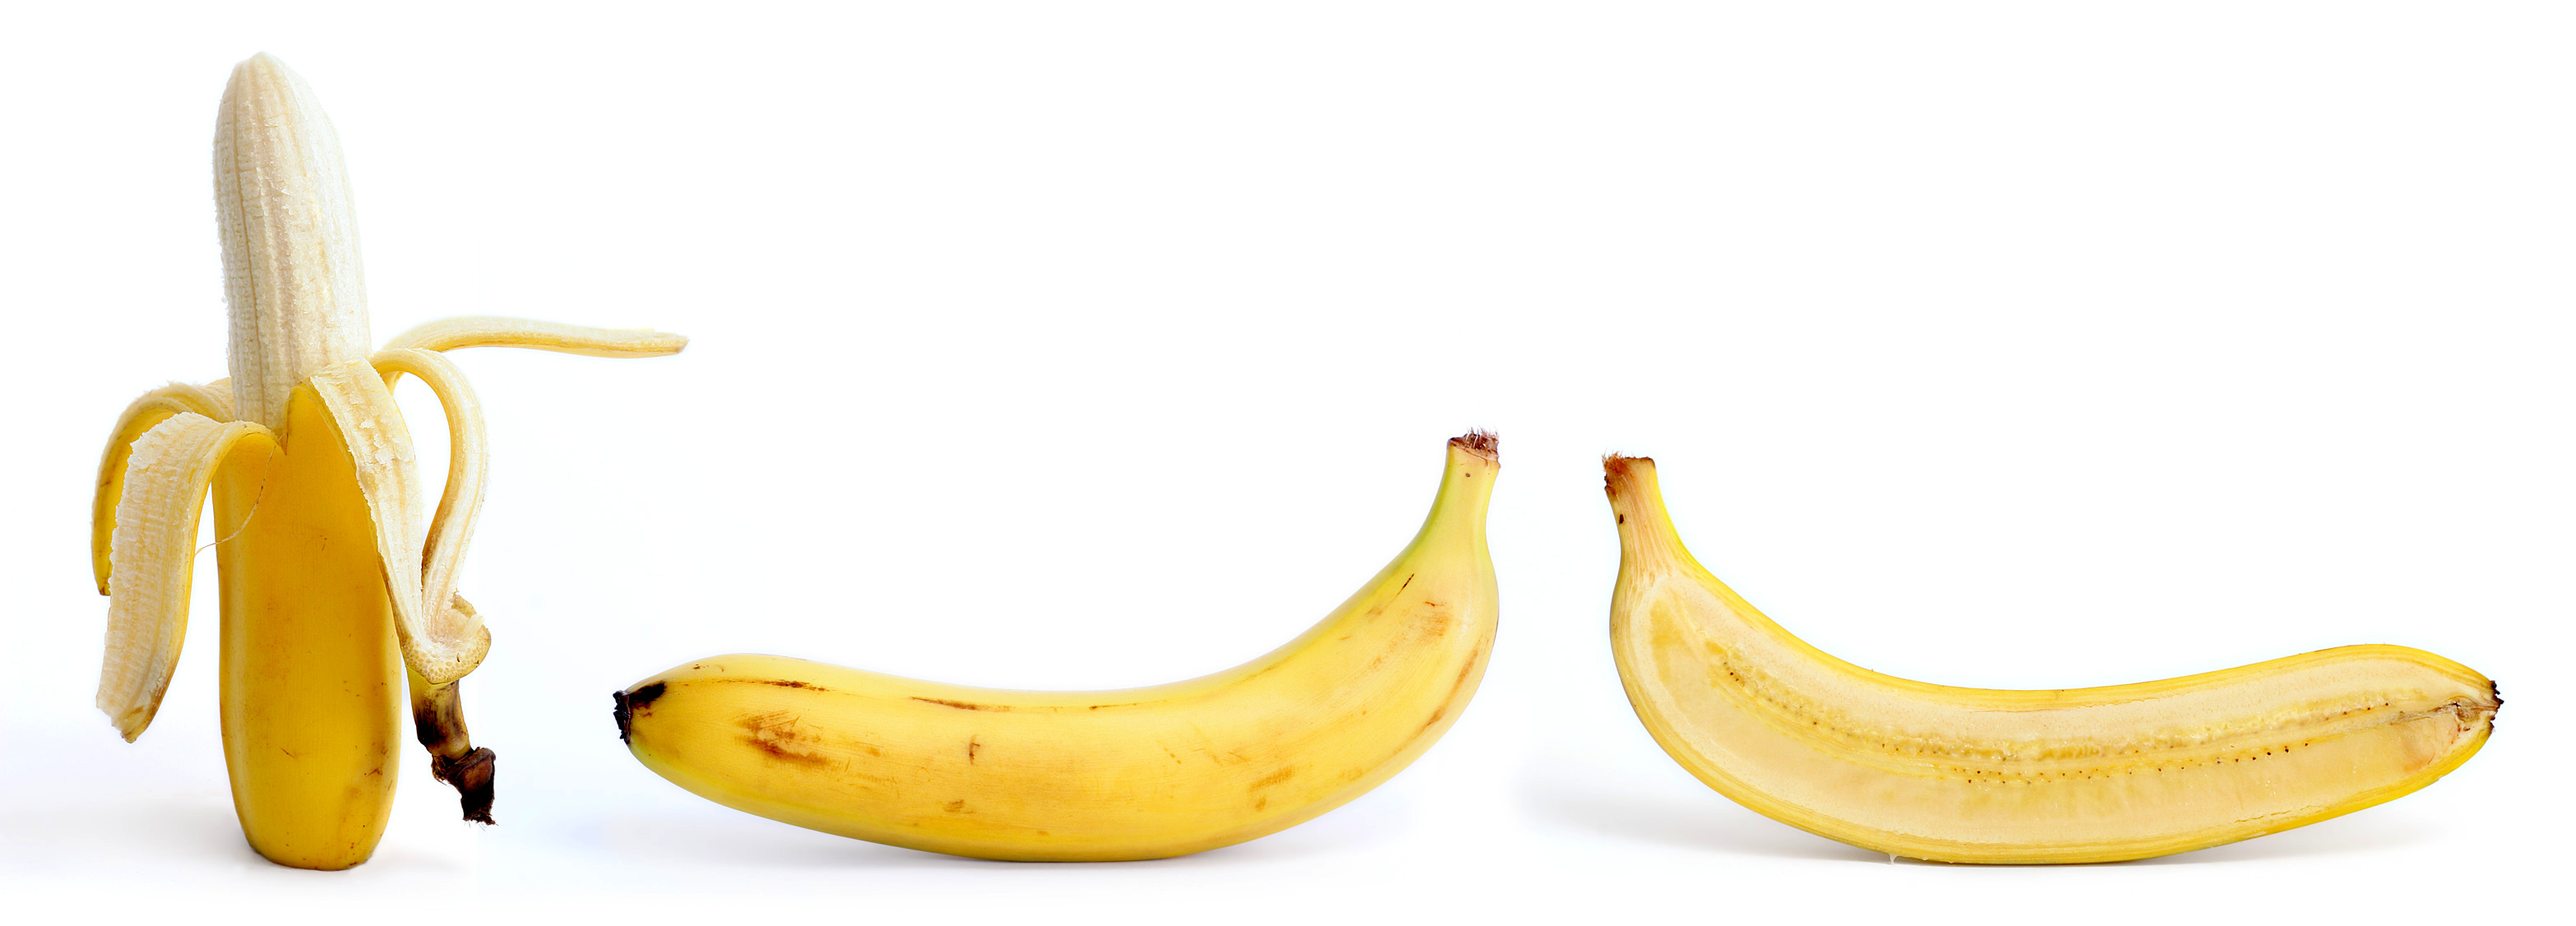 Banana Cross Section